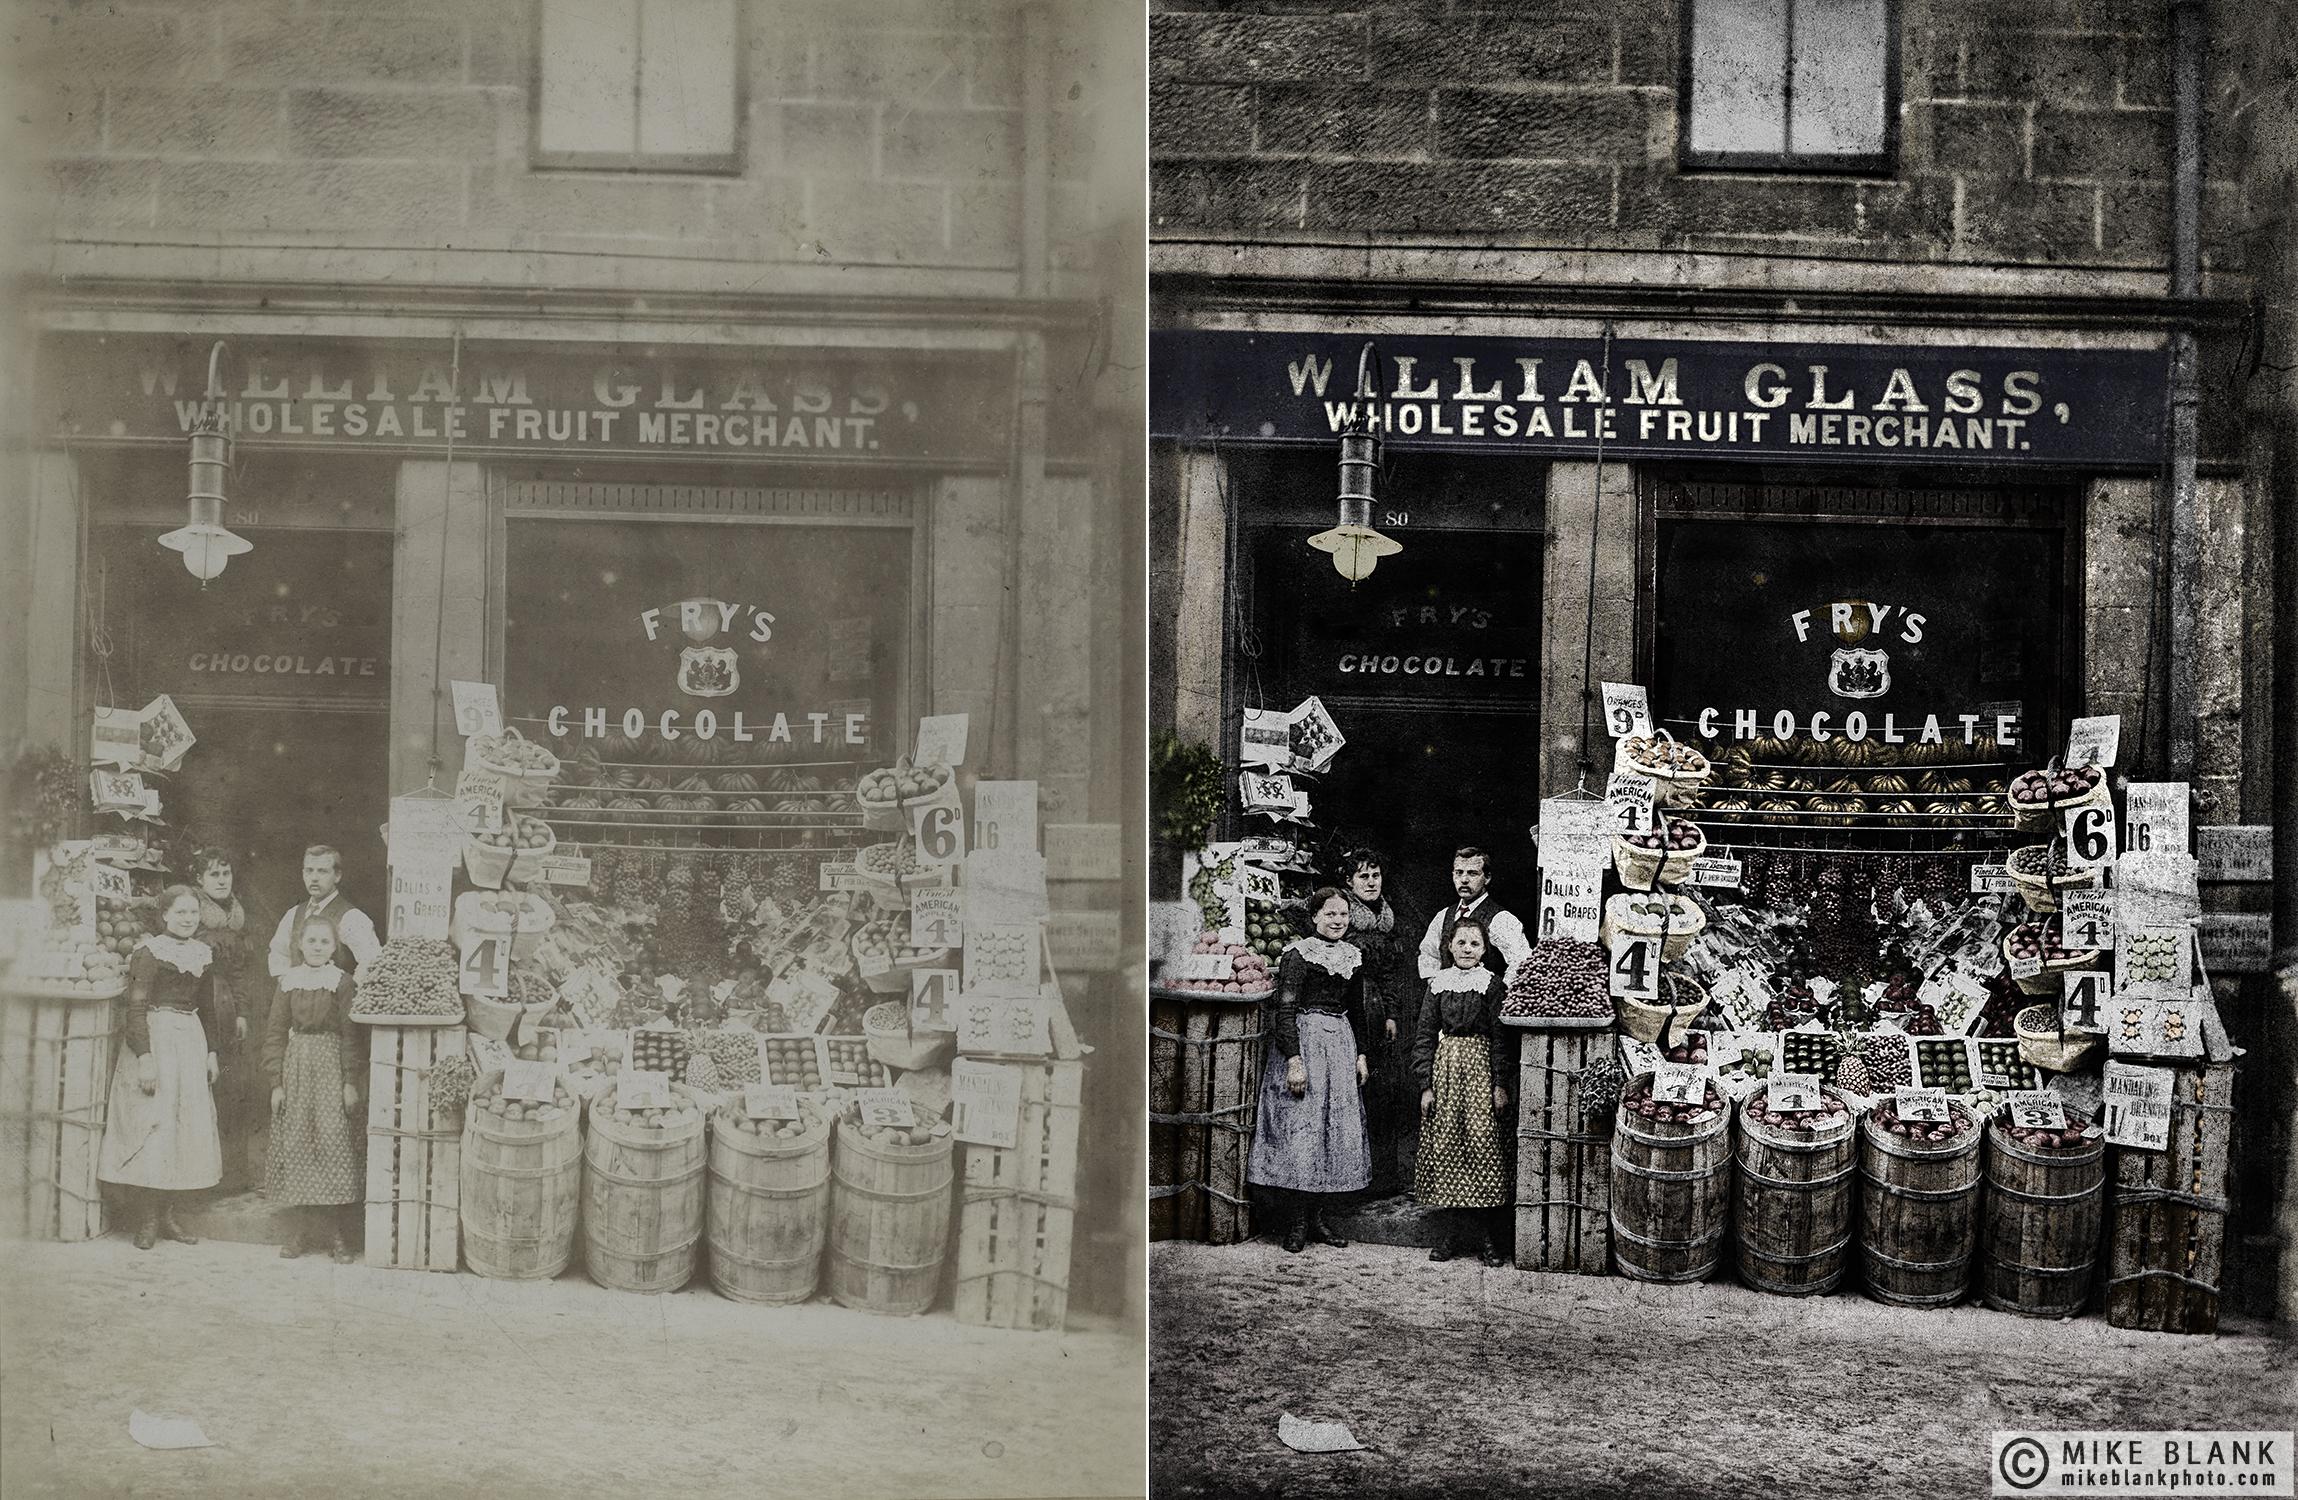 Digital restoration and colourisation: William Glass suit merchant, approx 1910, Hamilton, Scotland